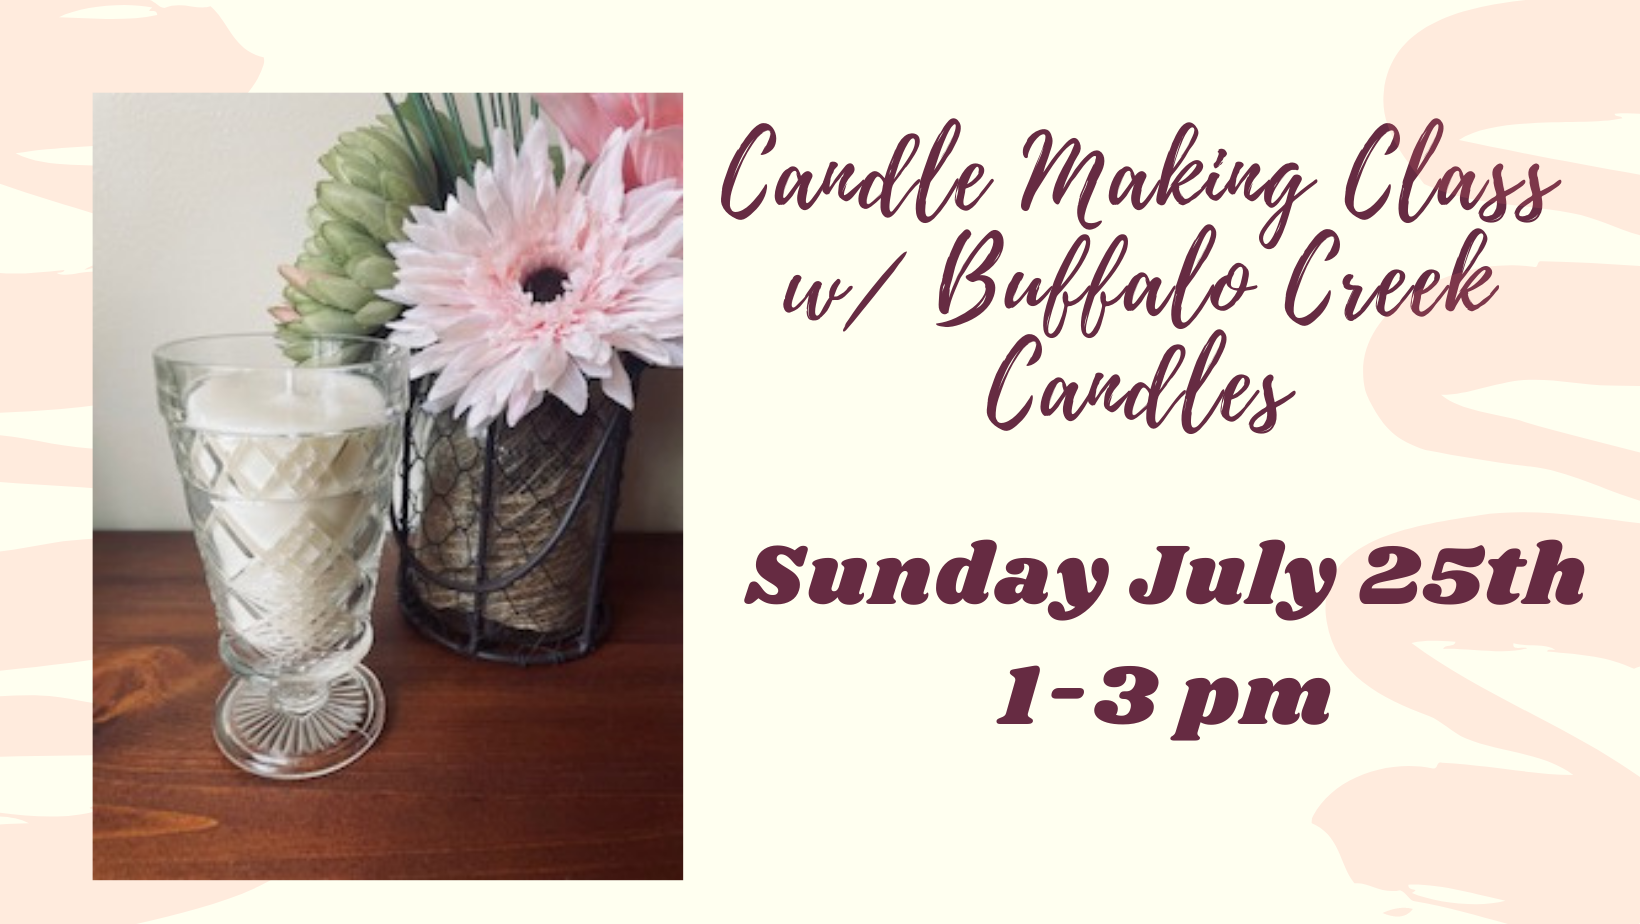 Candle Making Class w/ Buffalo Creek Candles